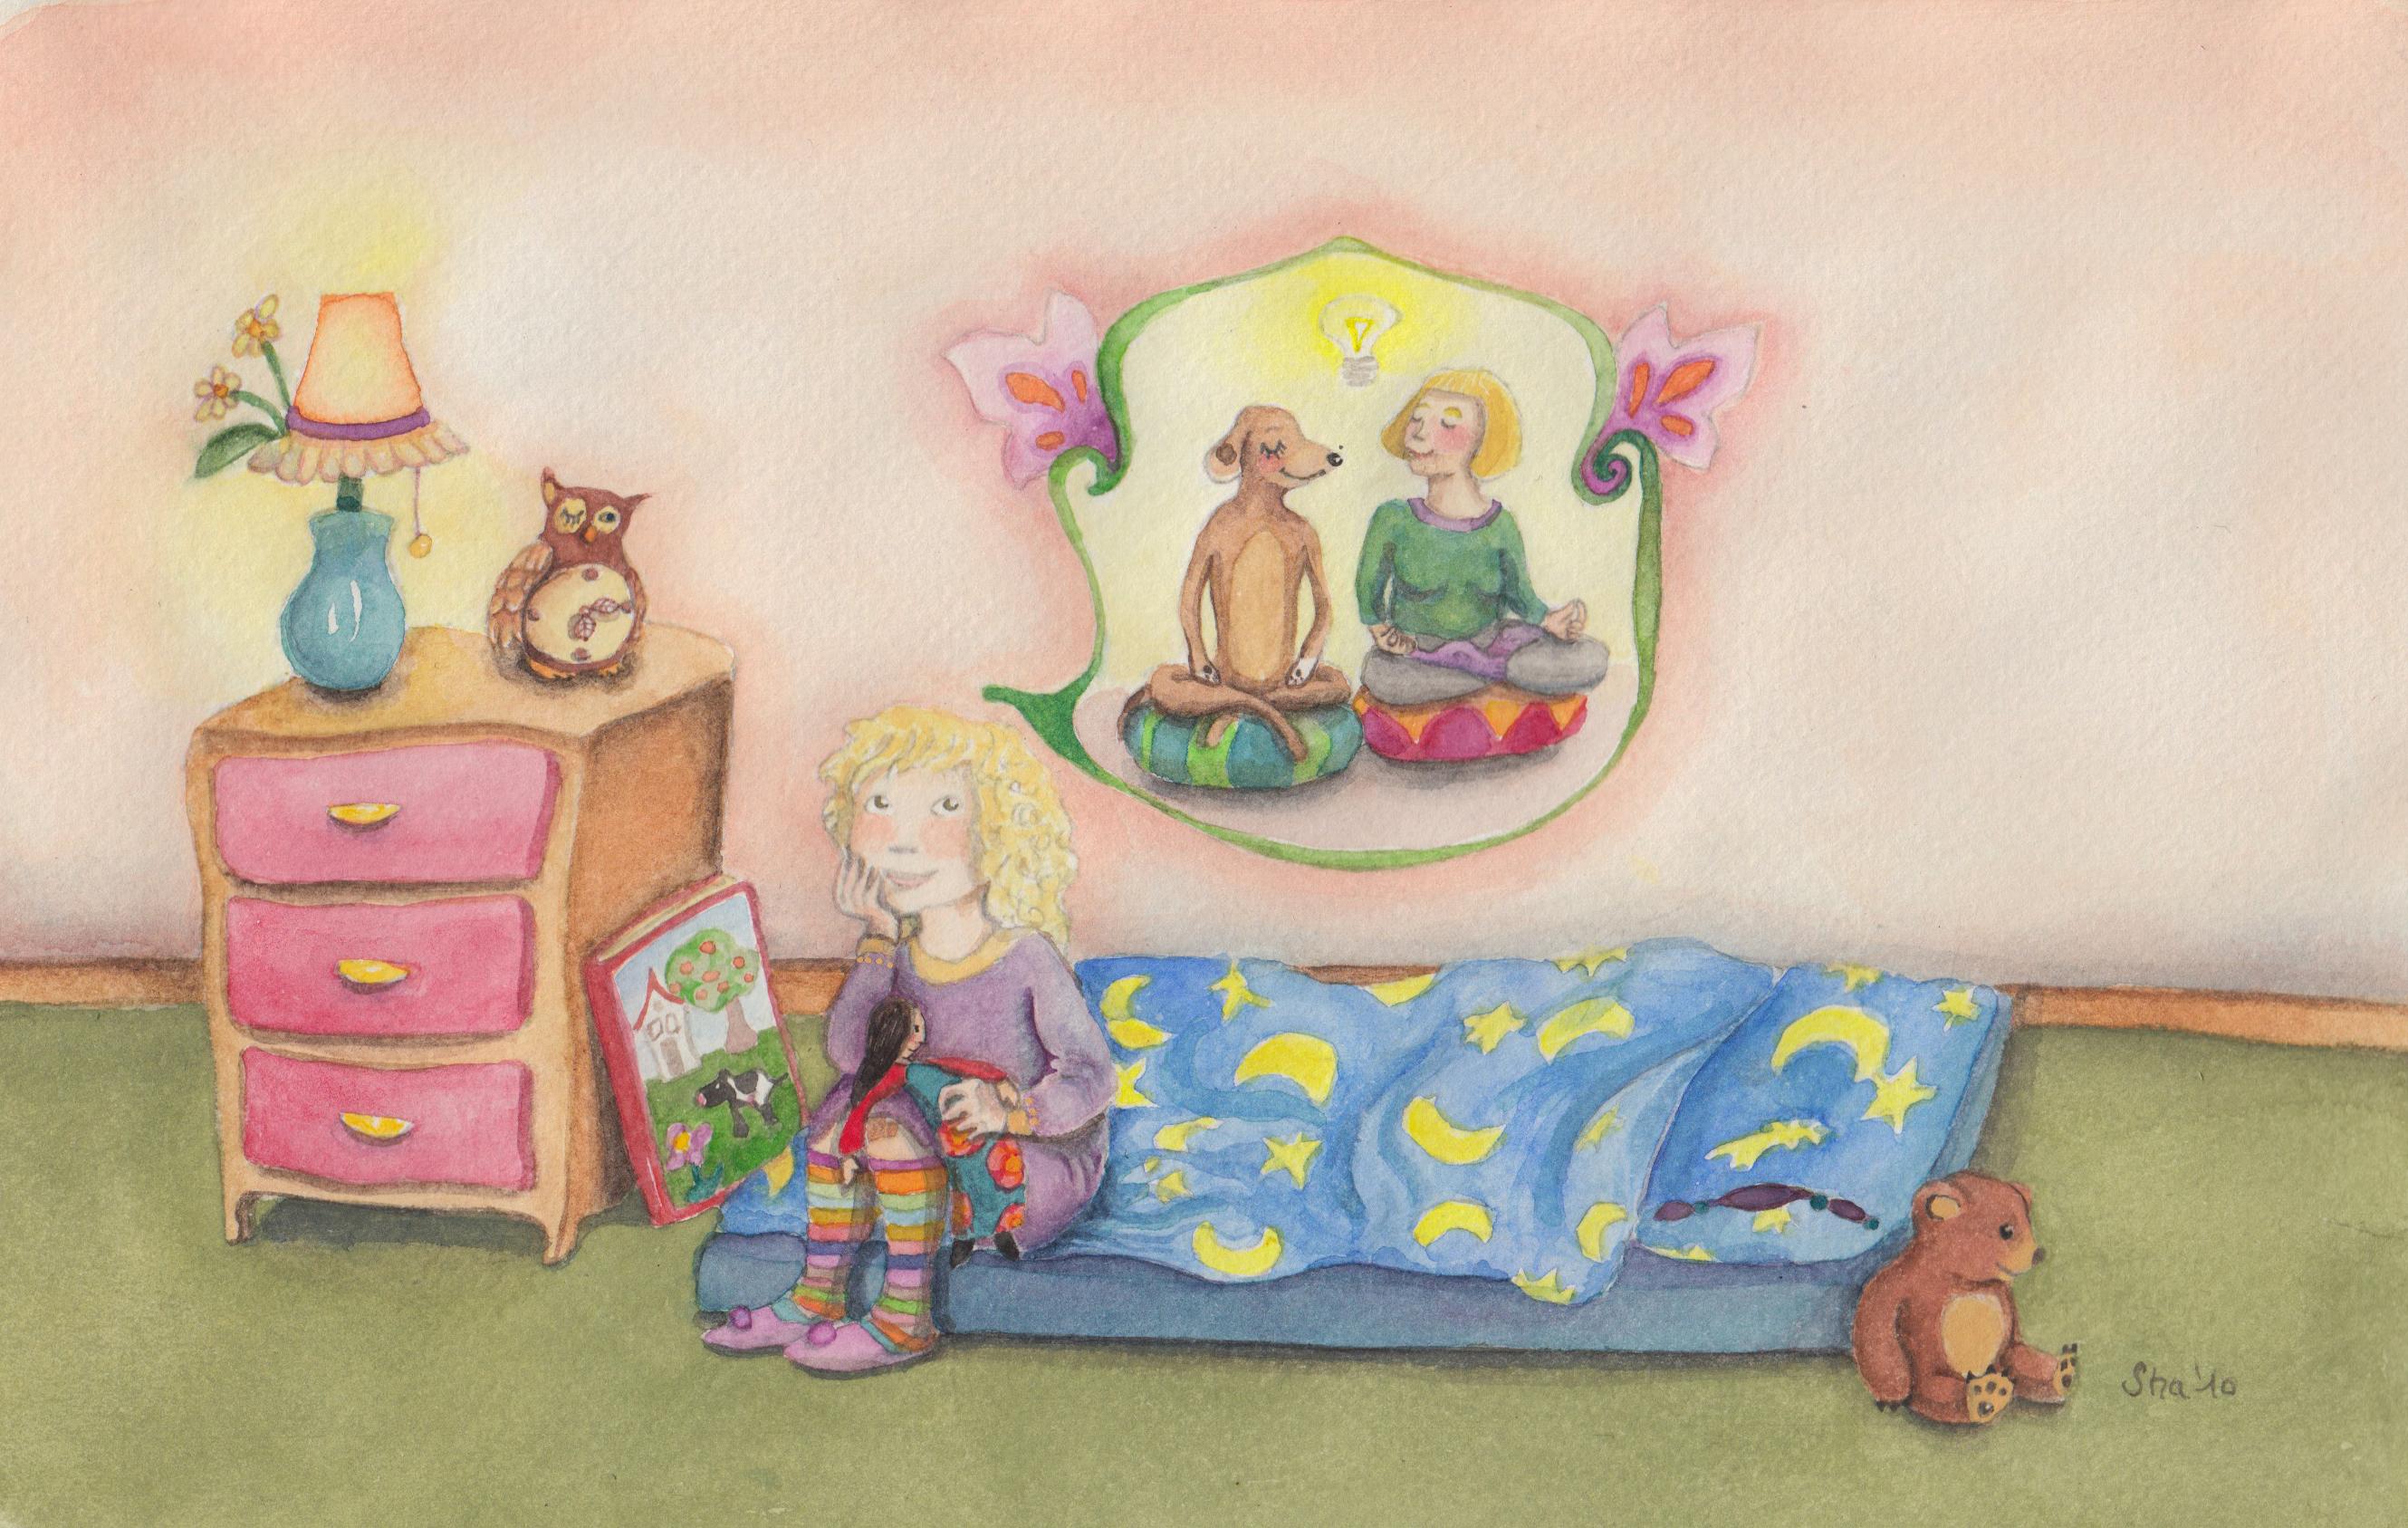 Illustration von Sharon Calman